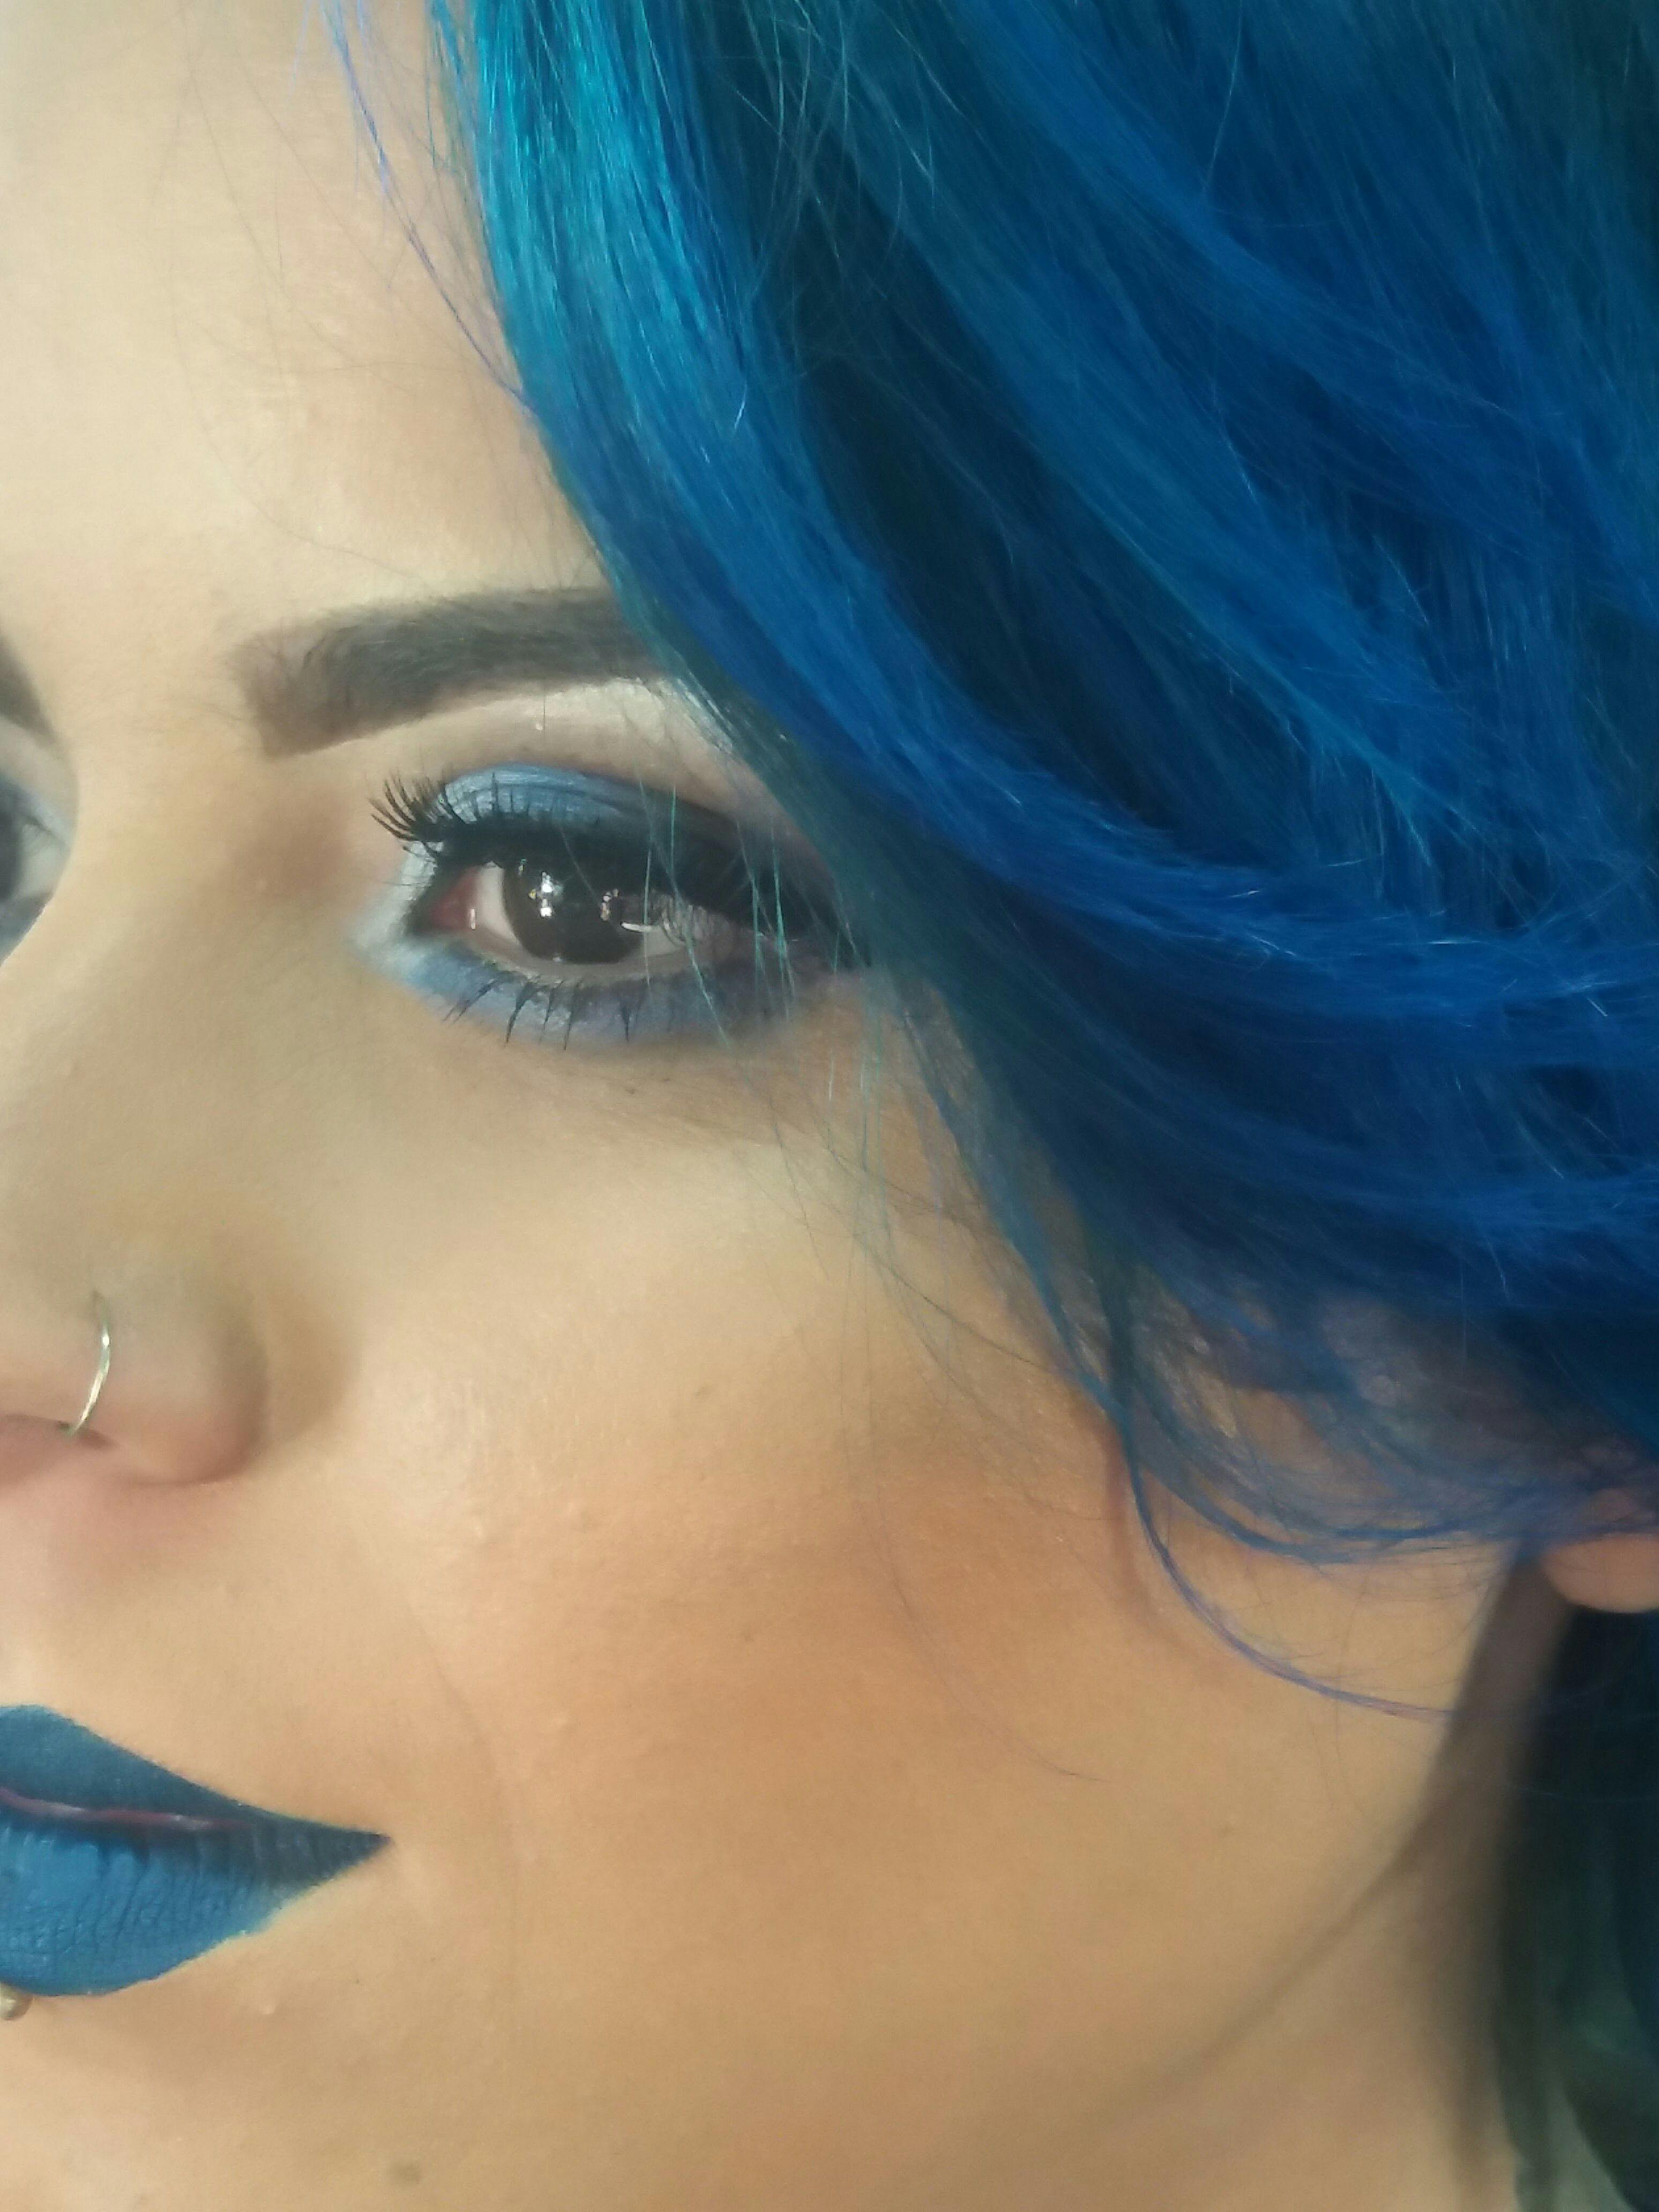 Make Azul...  #estilo #make #azul #marcante #top #arrase maquiagem manicure e pedicure maquiador(a) cabeleireiro(a) auxiliar cabeleireiro(a) escovista